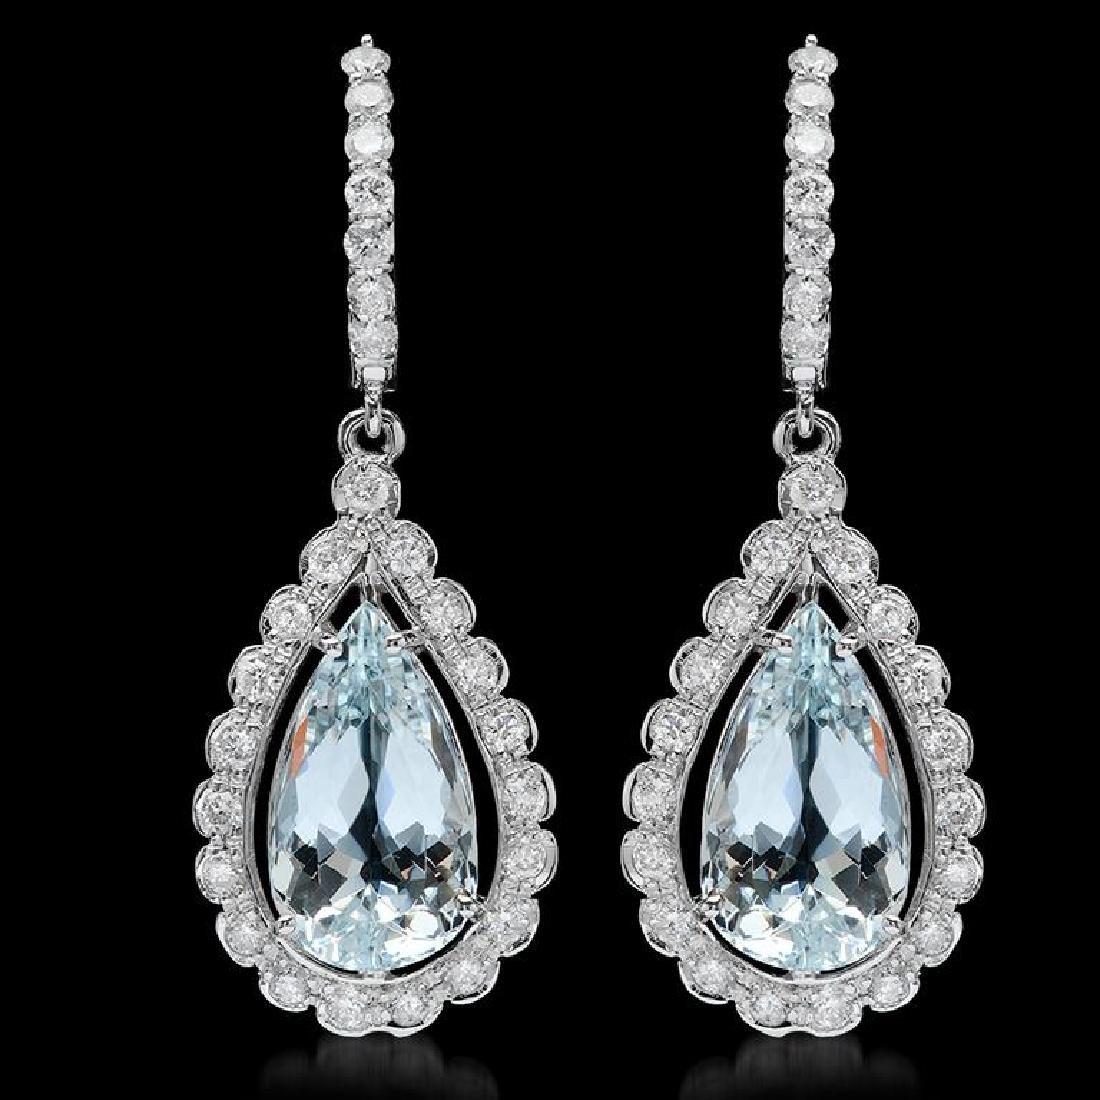 14k Gold 8.52ct Aquamarine 1.54ct Diamond Earrings